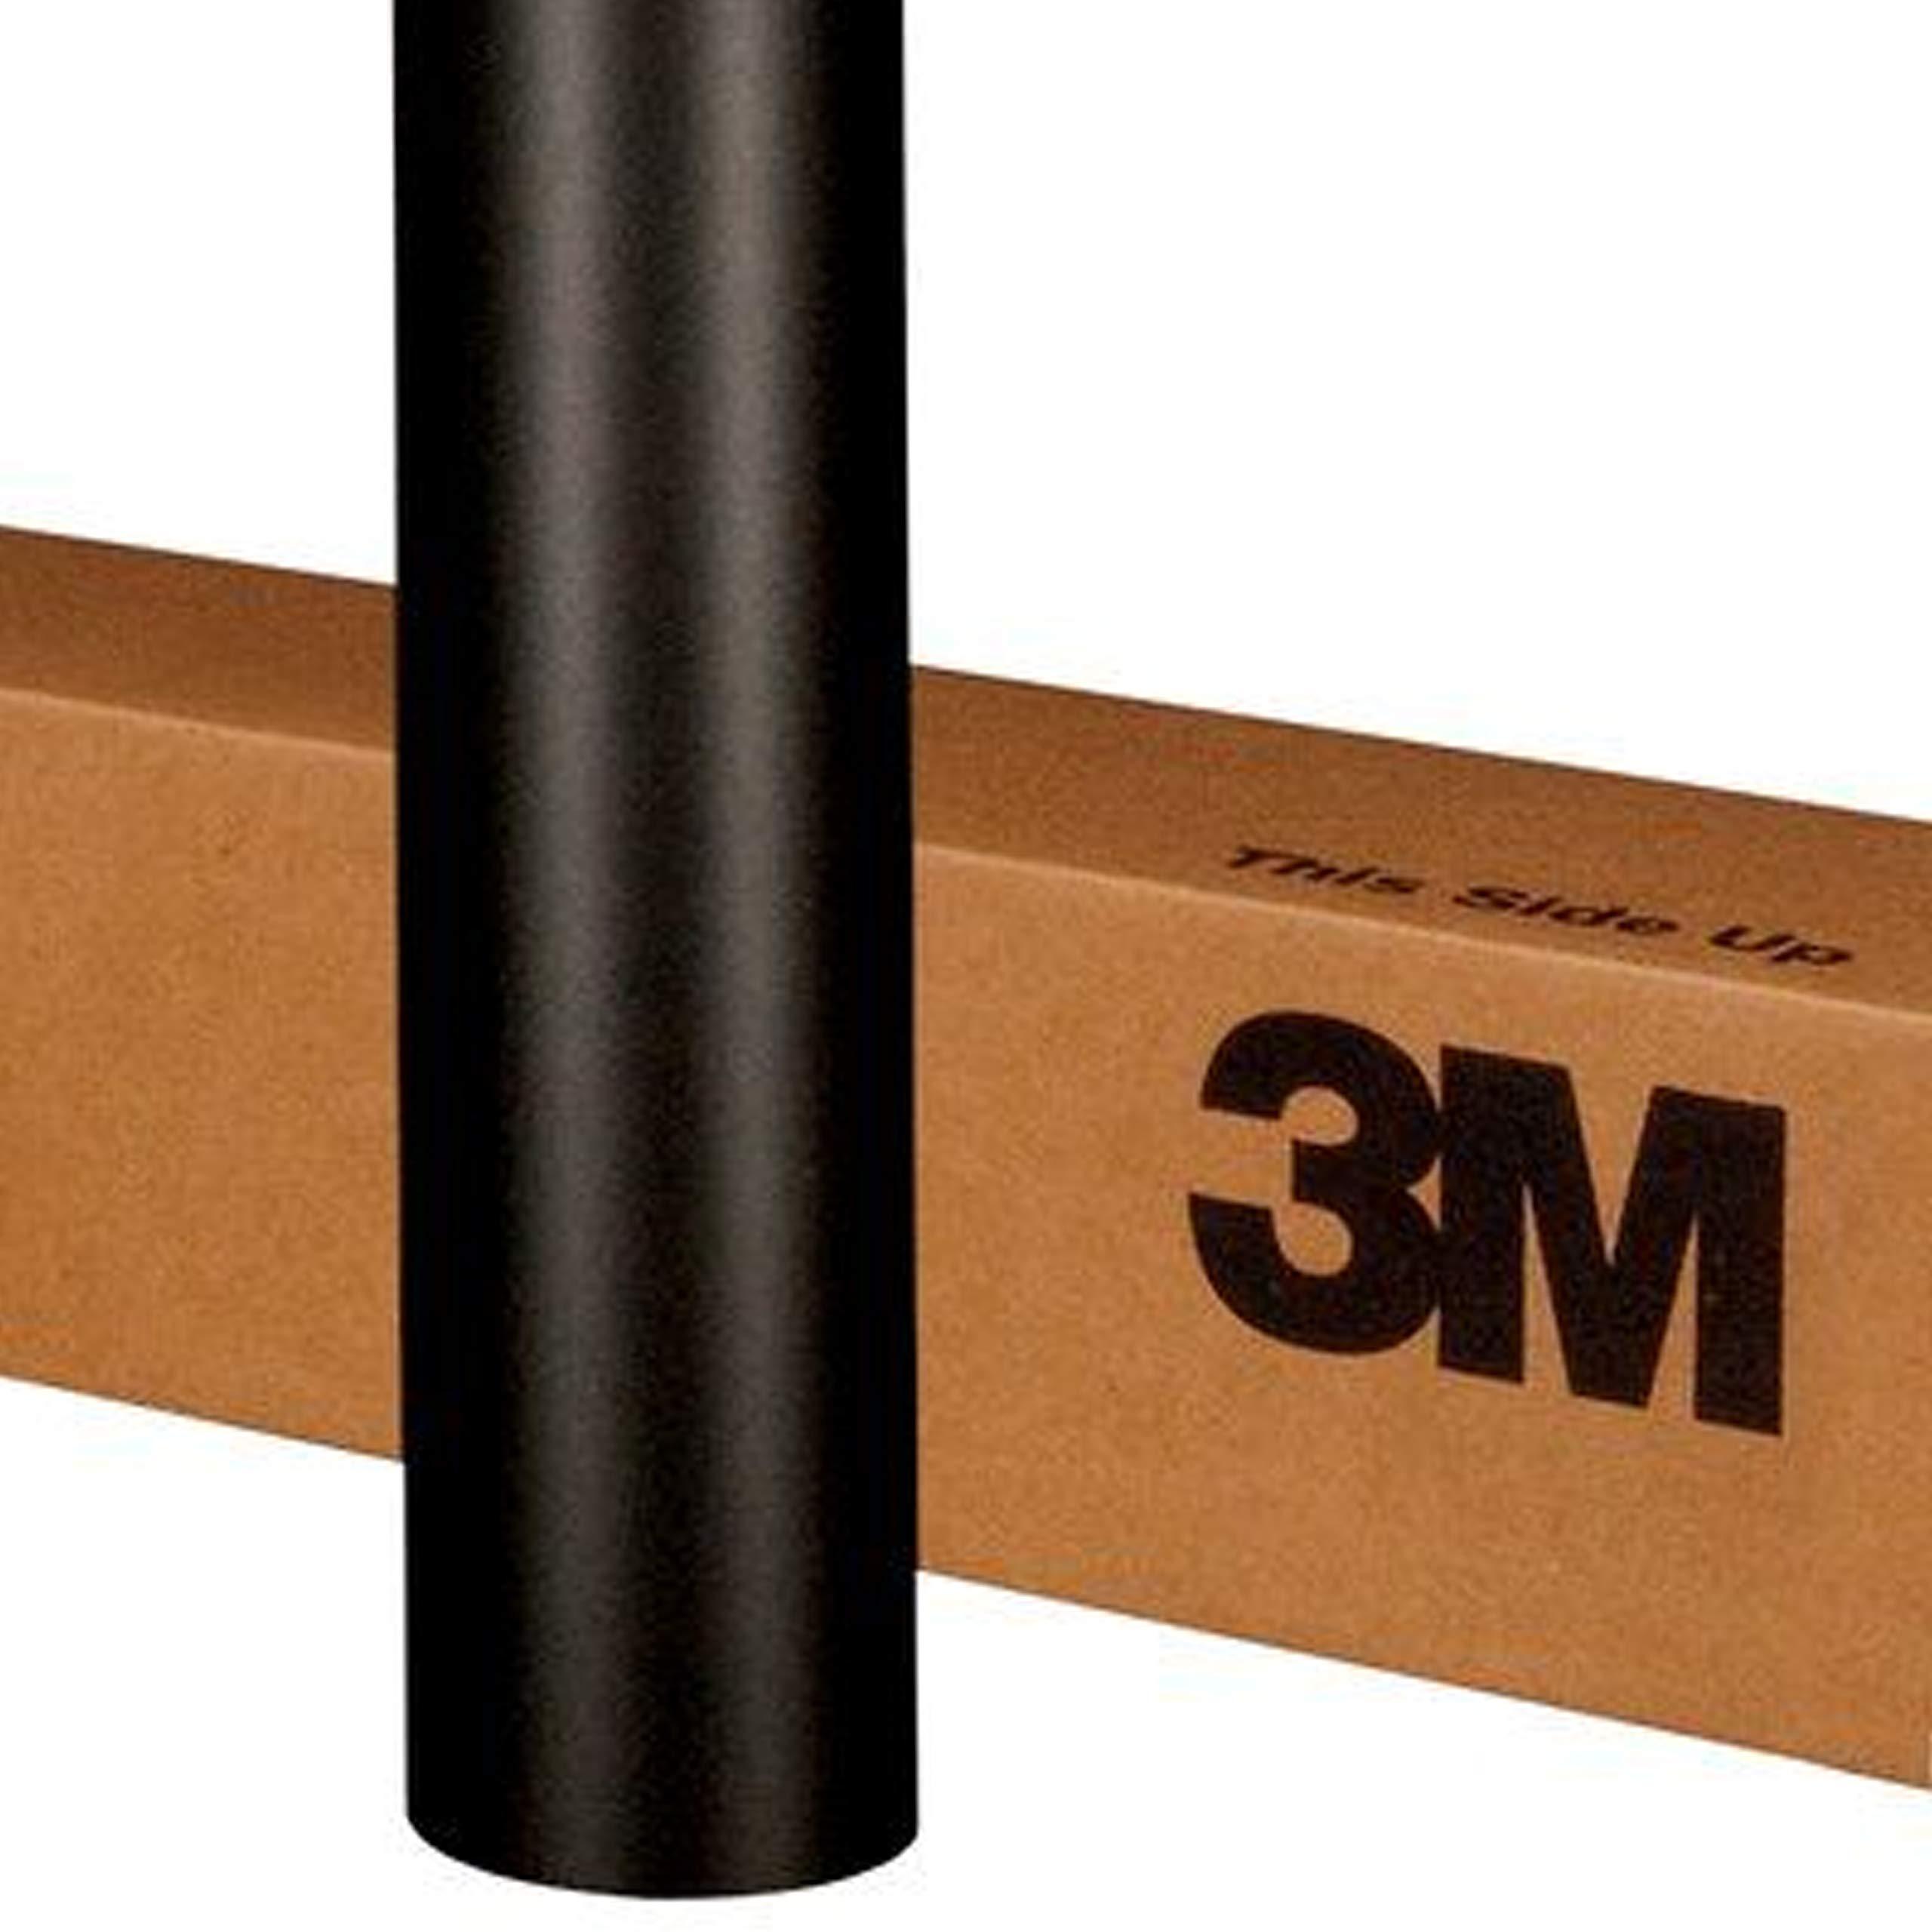 3M 1080 M12 MATTE BLACK 3in x 5in (SAMPLE SIZE) Car Wrap Vinyl Film by 3M (Image #1)